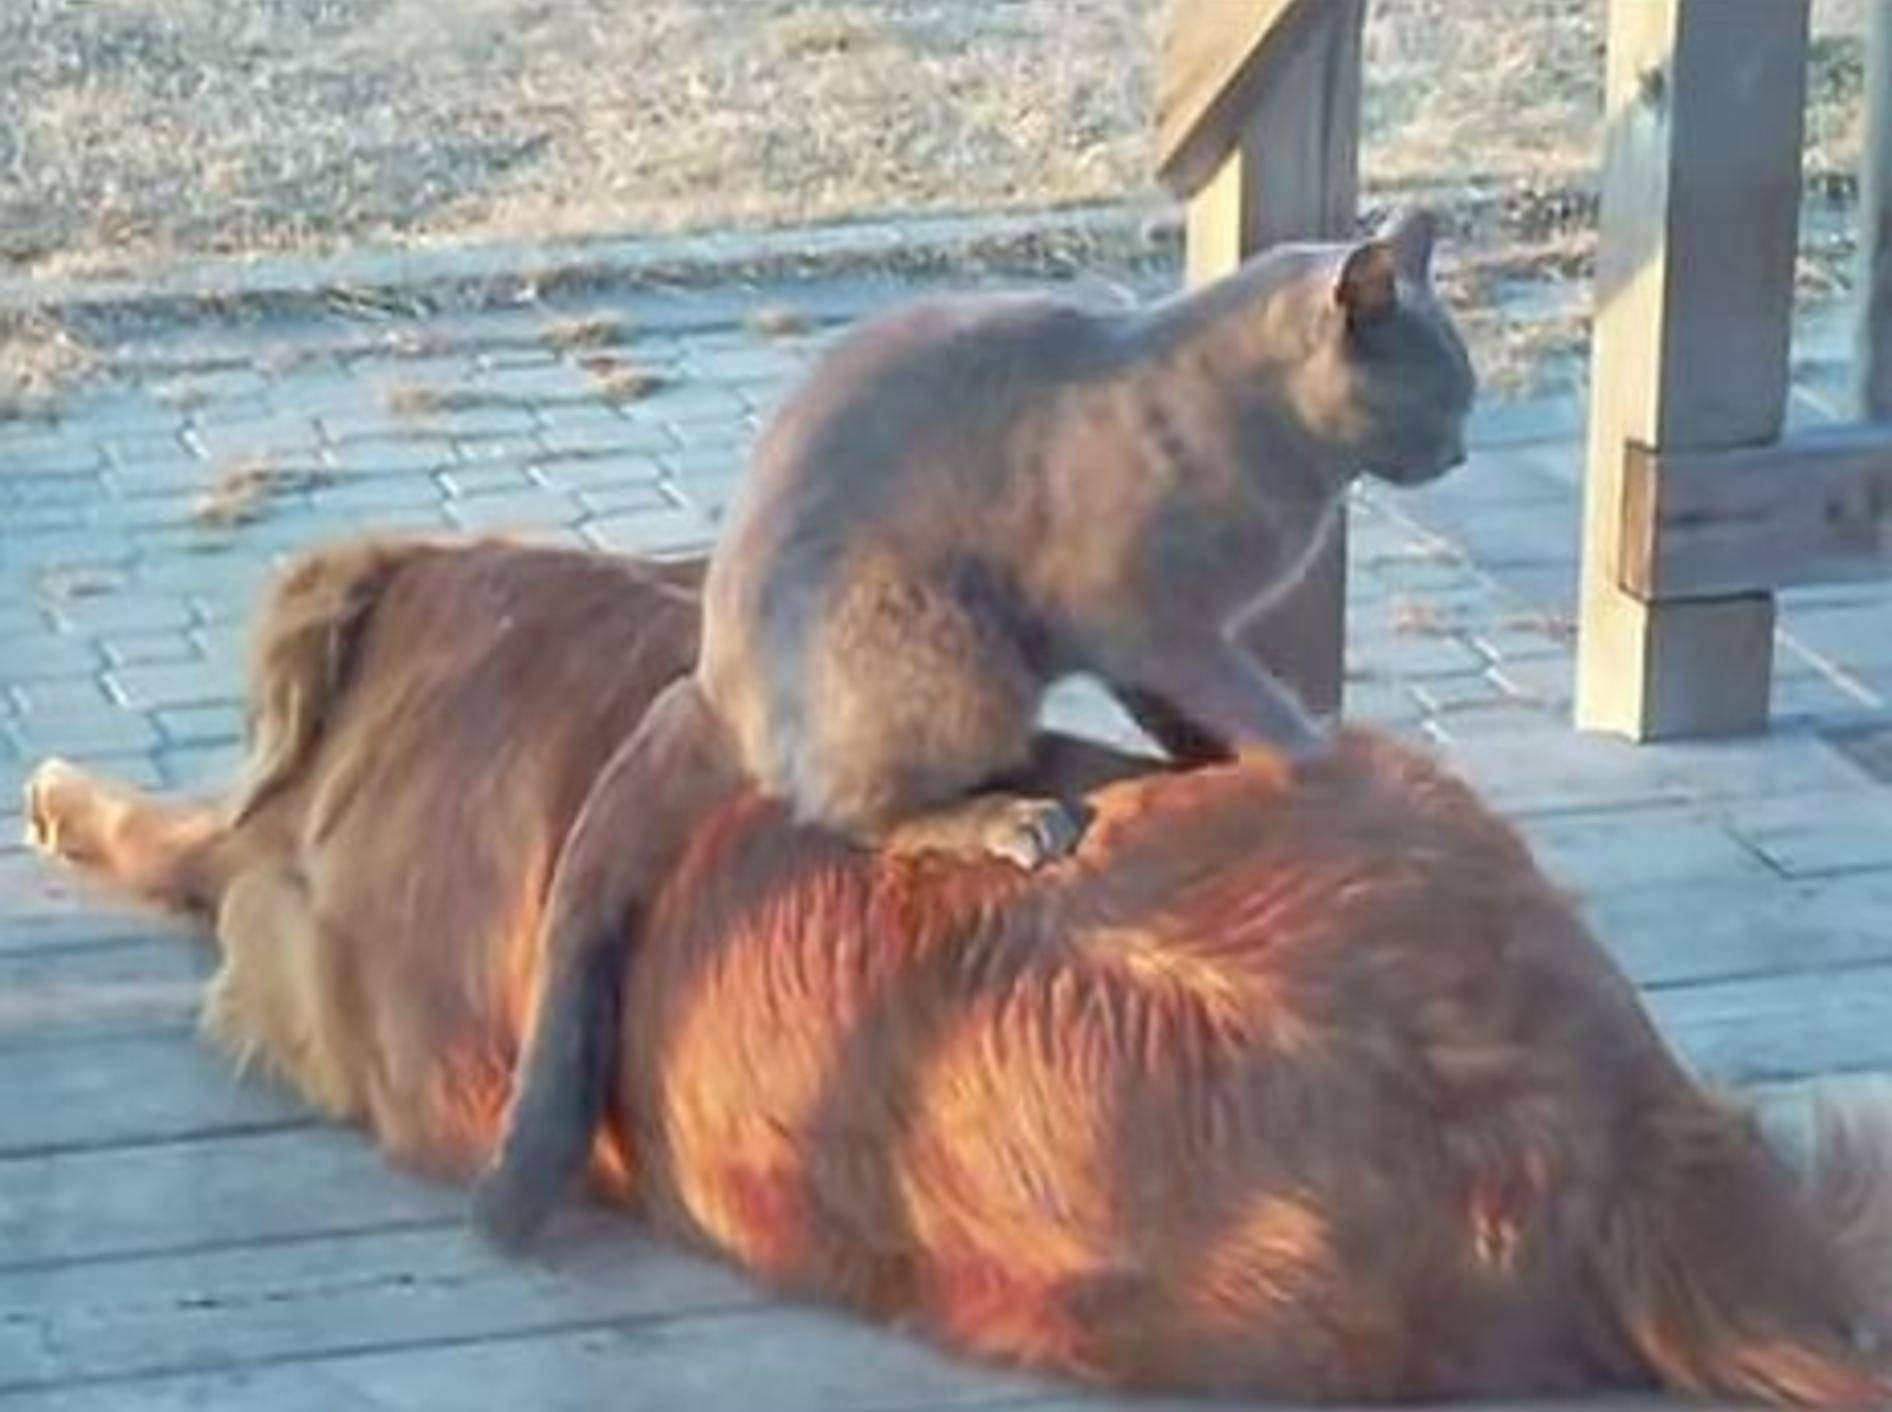 So nett sind Katzen manchmal zu Hunden – Bild: Youtube / YourLifeCycle